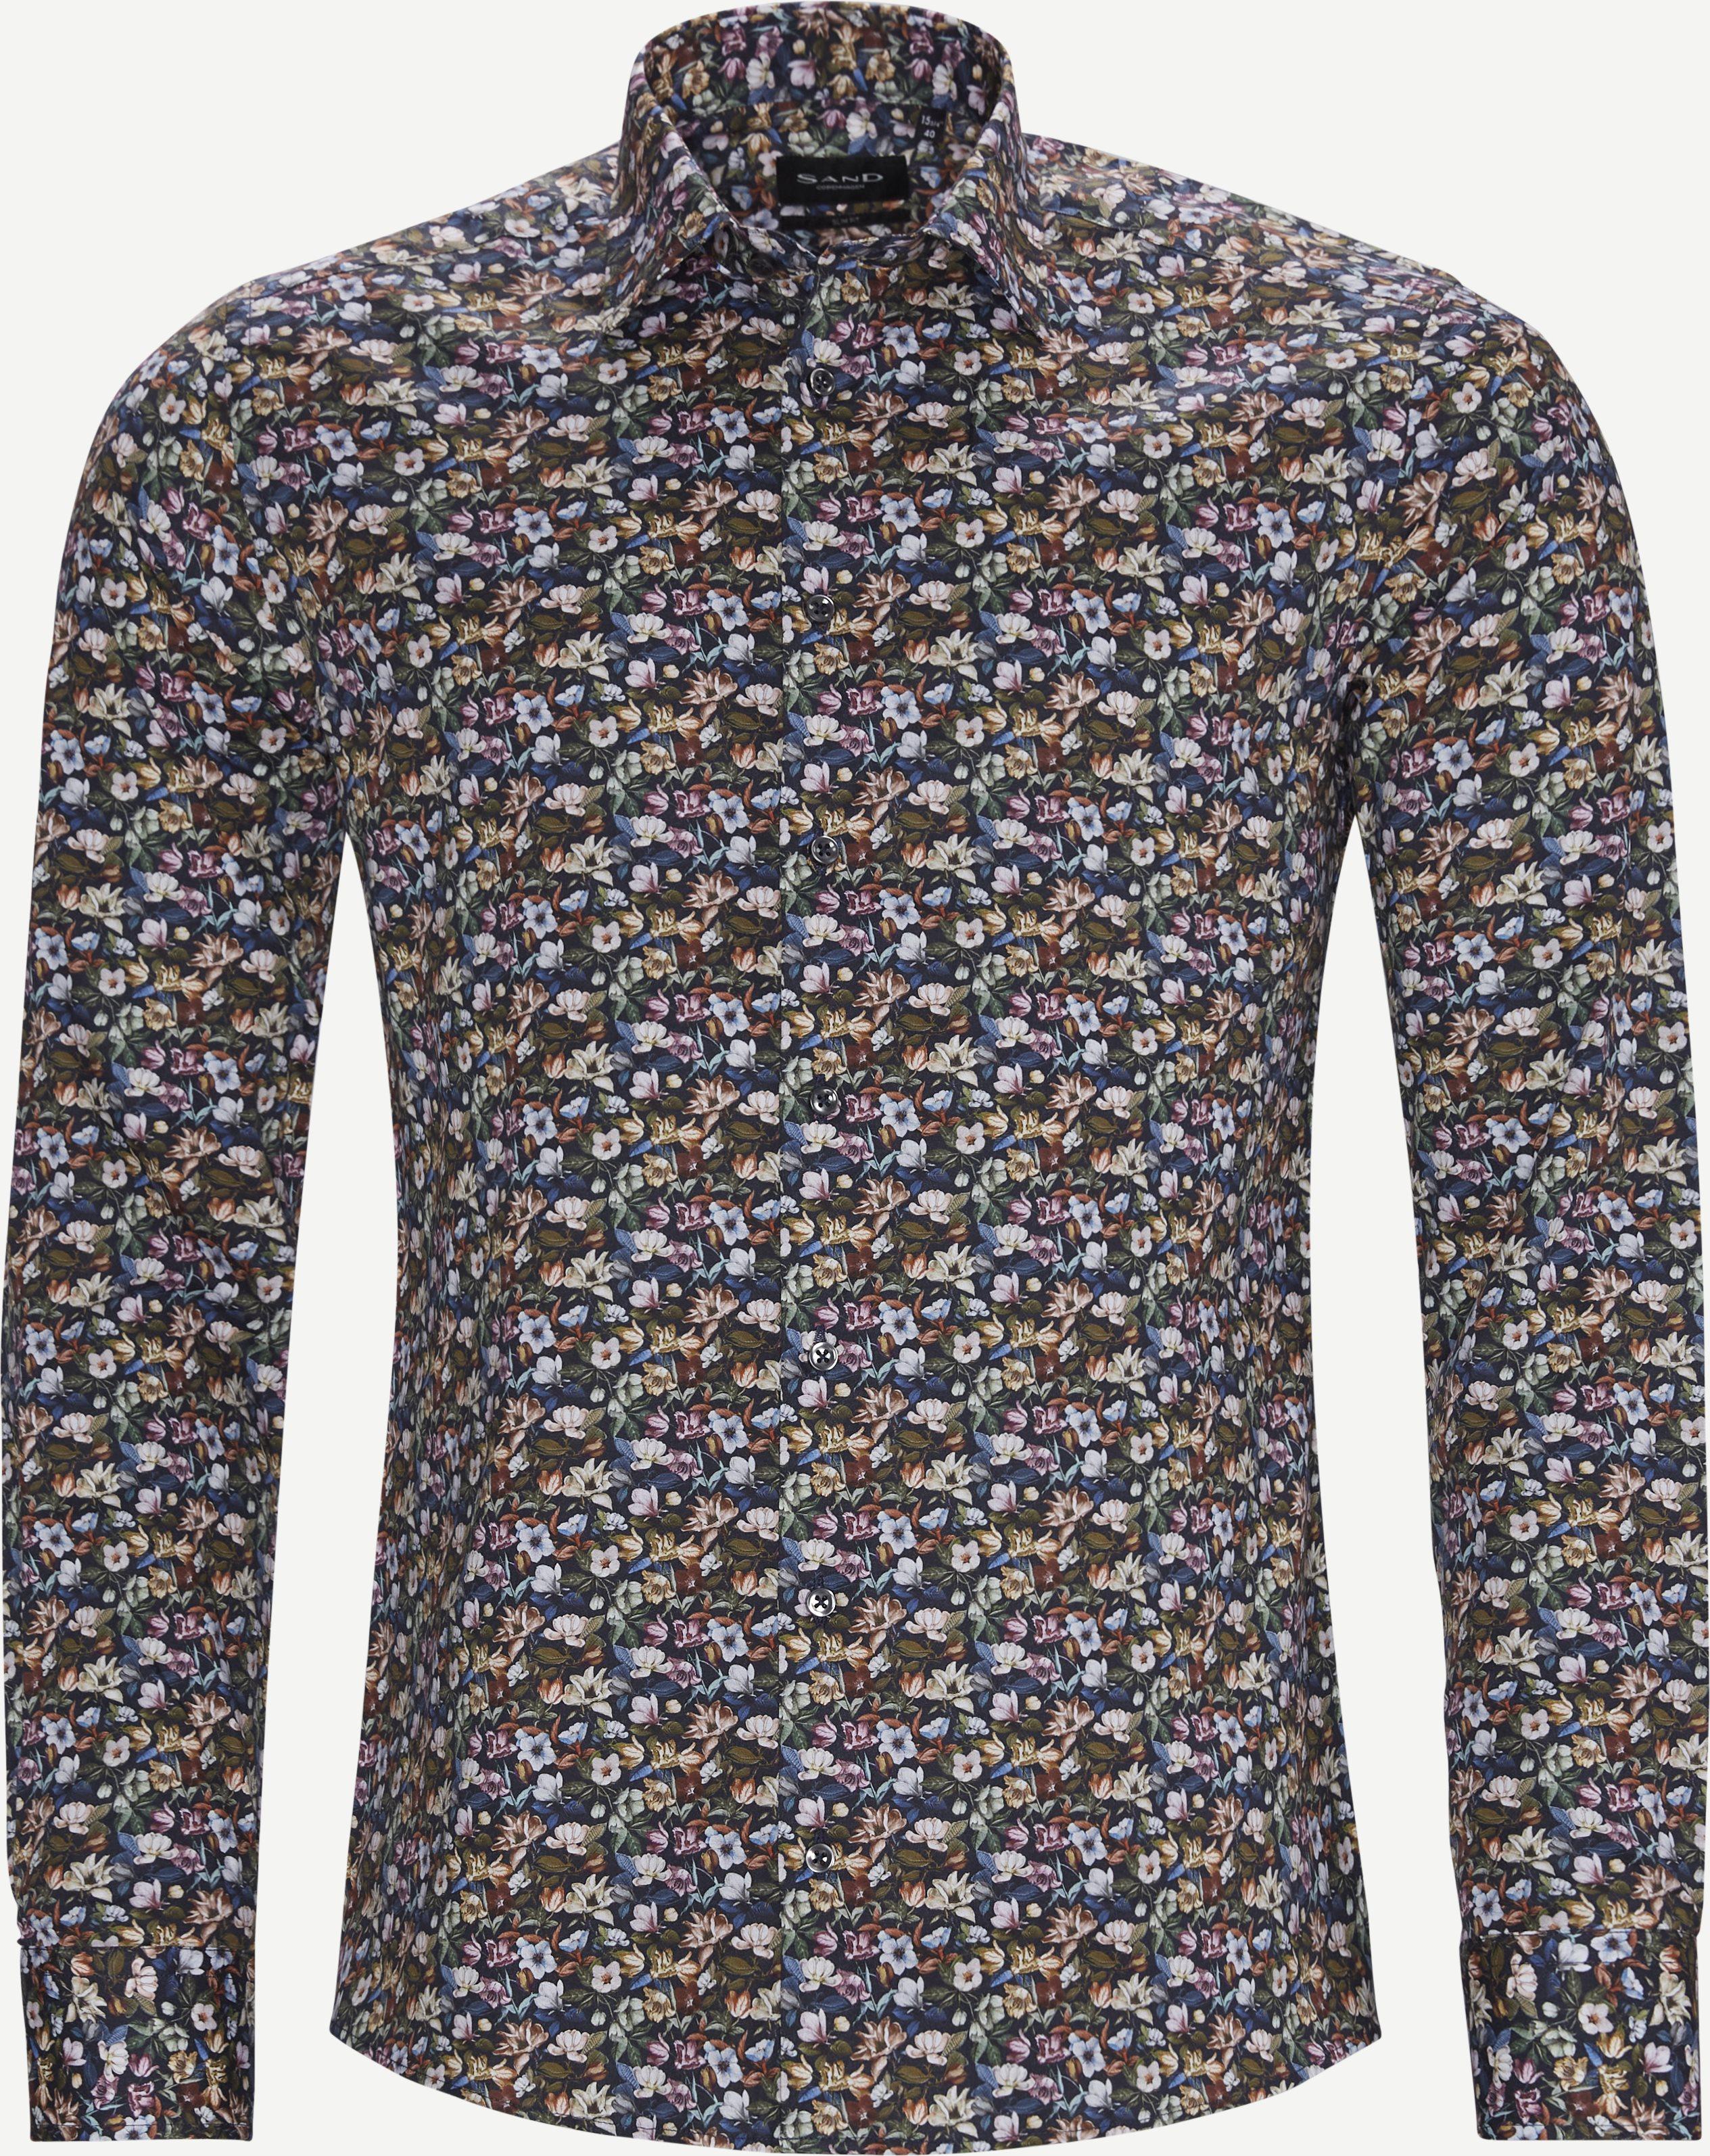 8644 Iver 2/State N 2 Skjorte - Skjorter - Grøn